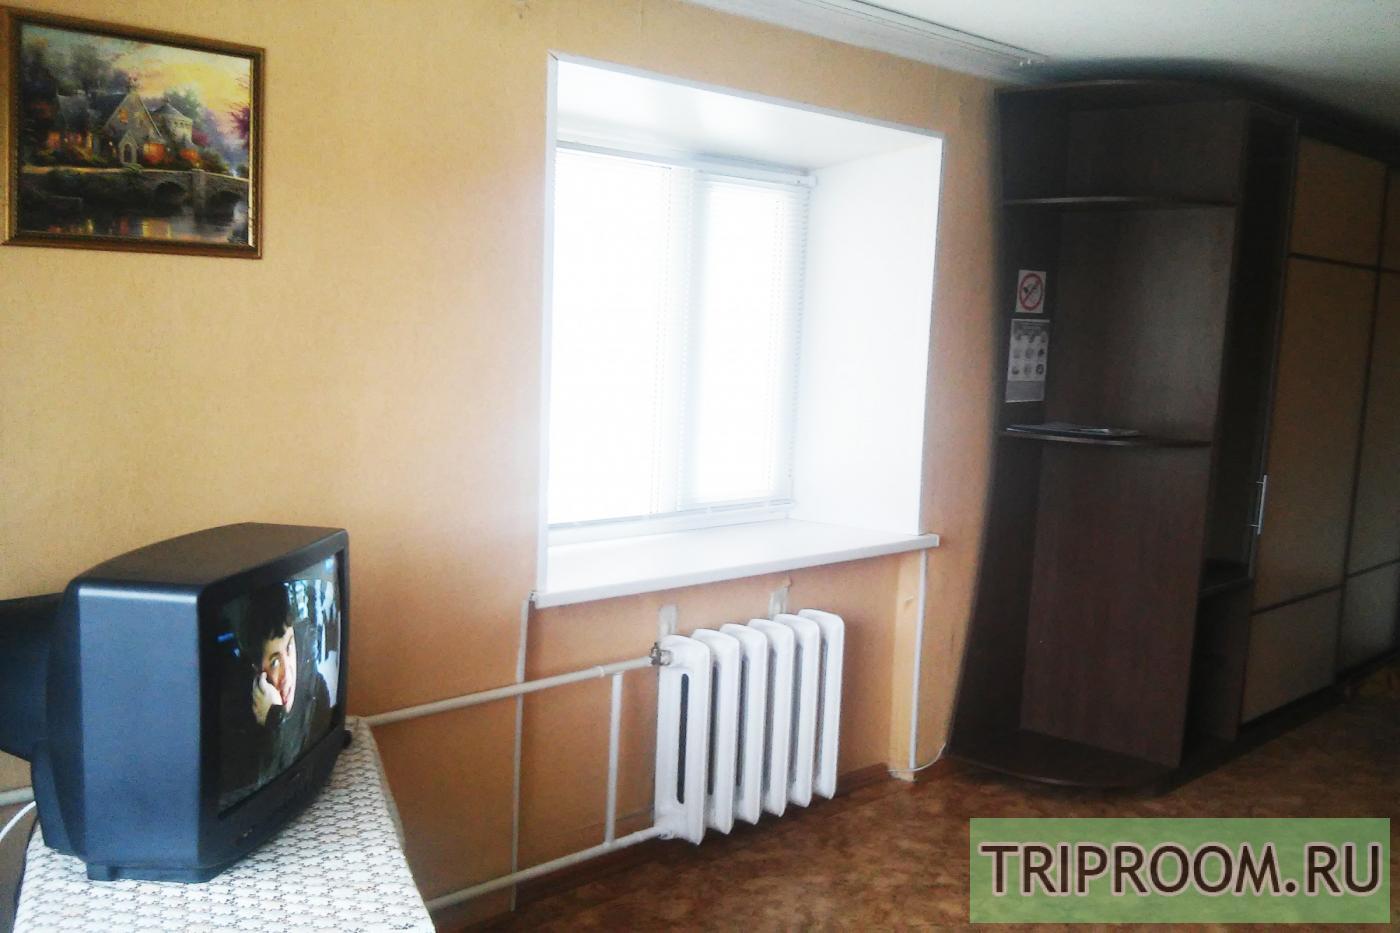 1-комнатная квартира посуточно (вариант № 34542), ул. Маршала Рыбалко, фото № 5